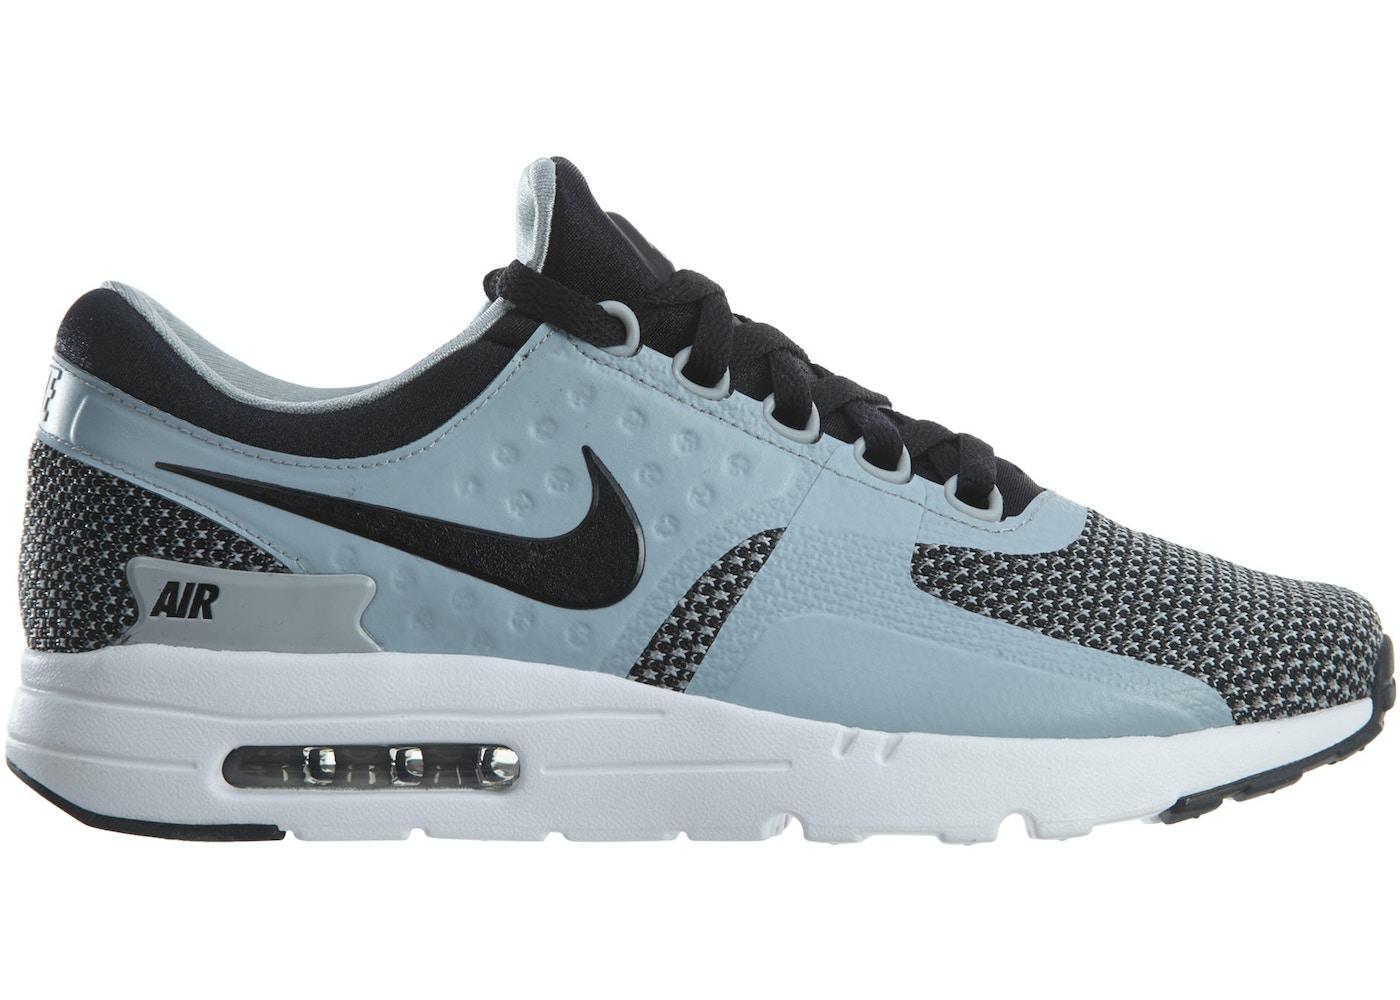 new style 01c4d 23f1d Nike Air Max Zero Essential Black/Black/Wolf Grey